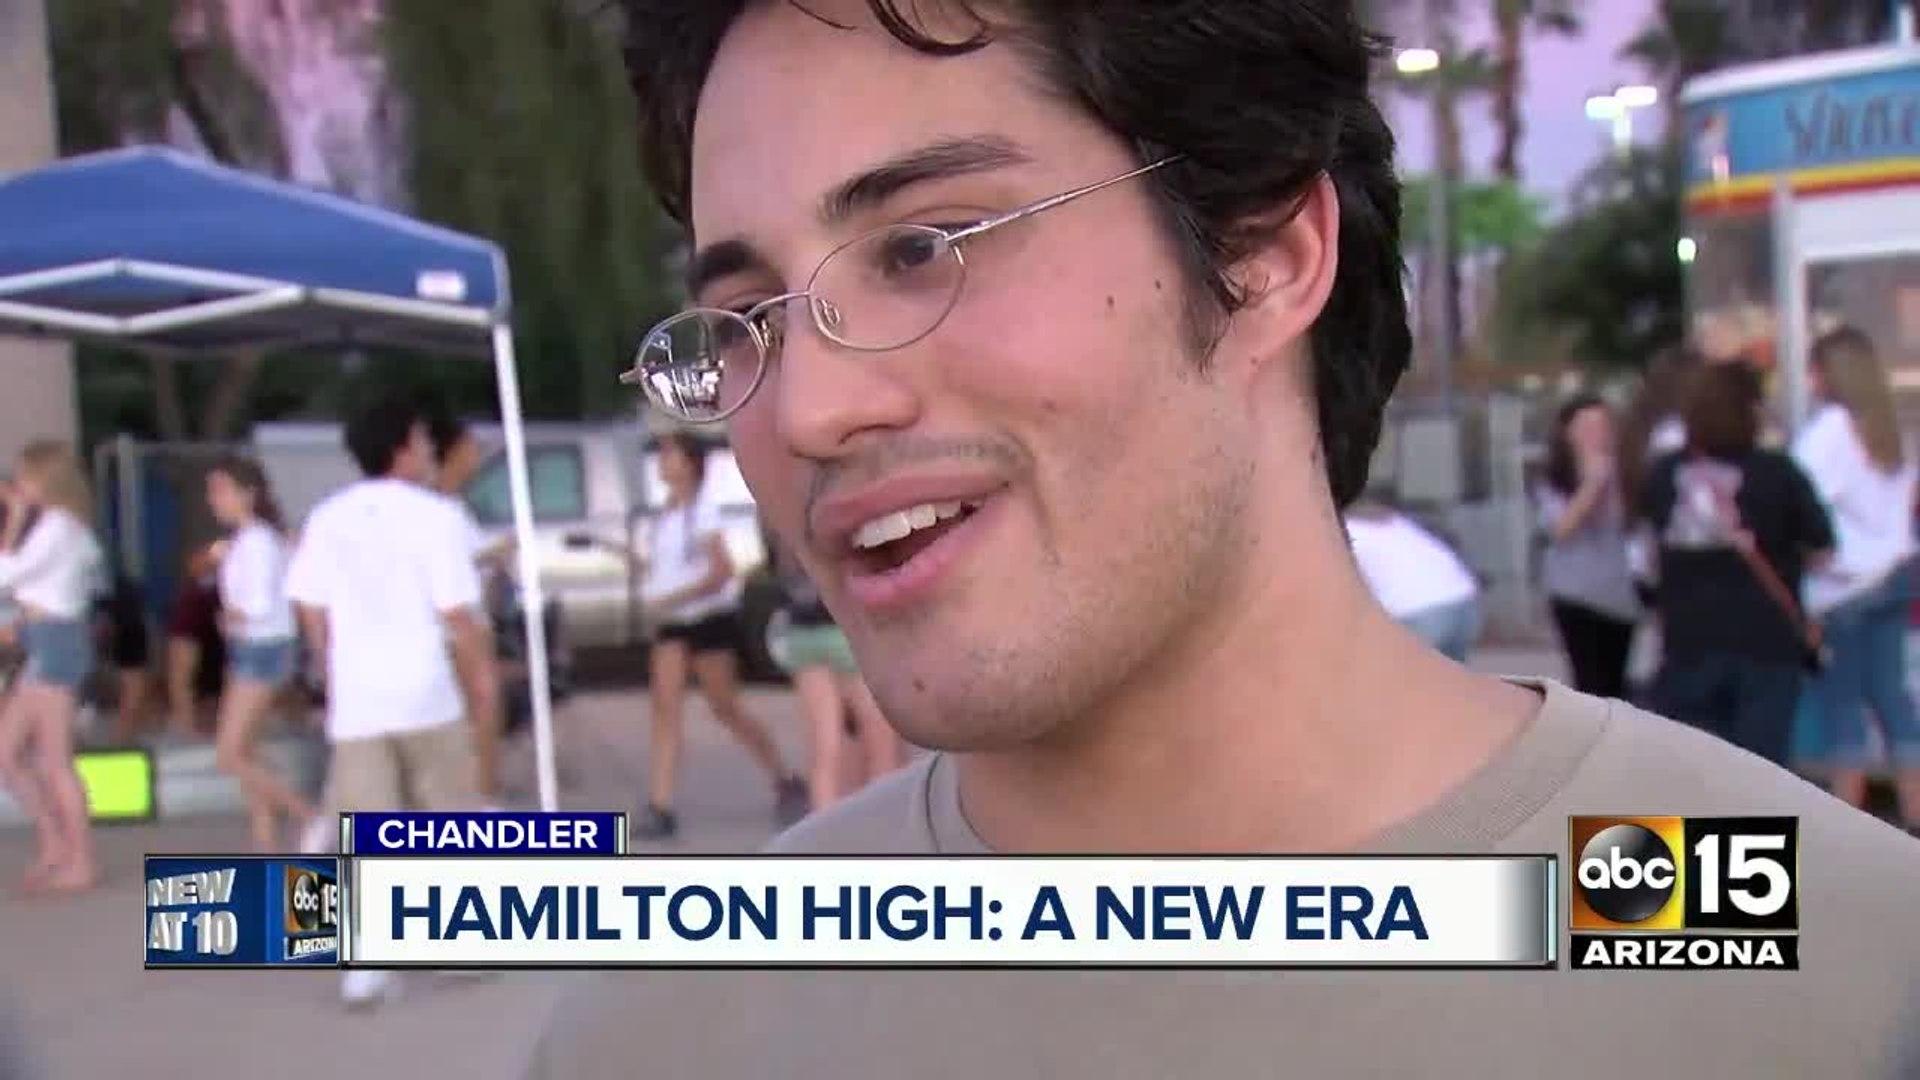 Hamilton High School moving forward under new football program